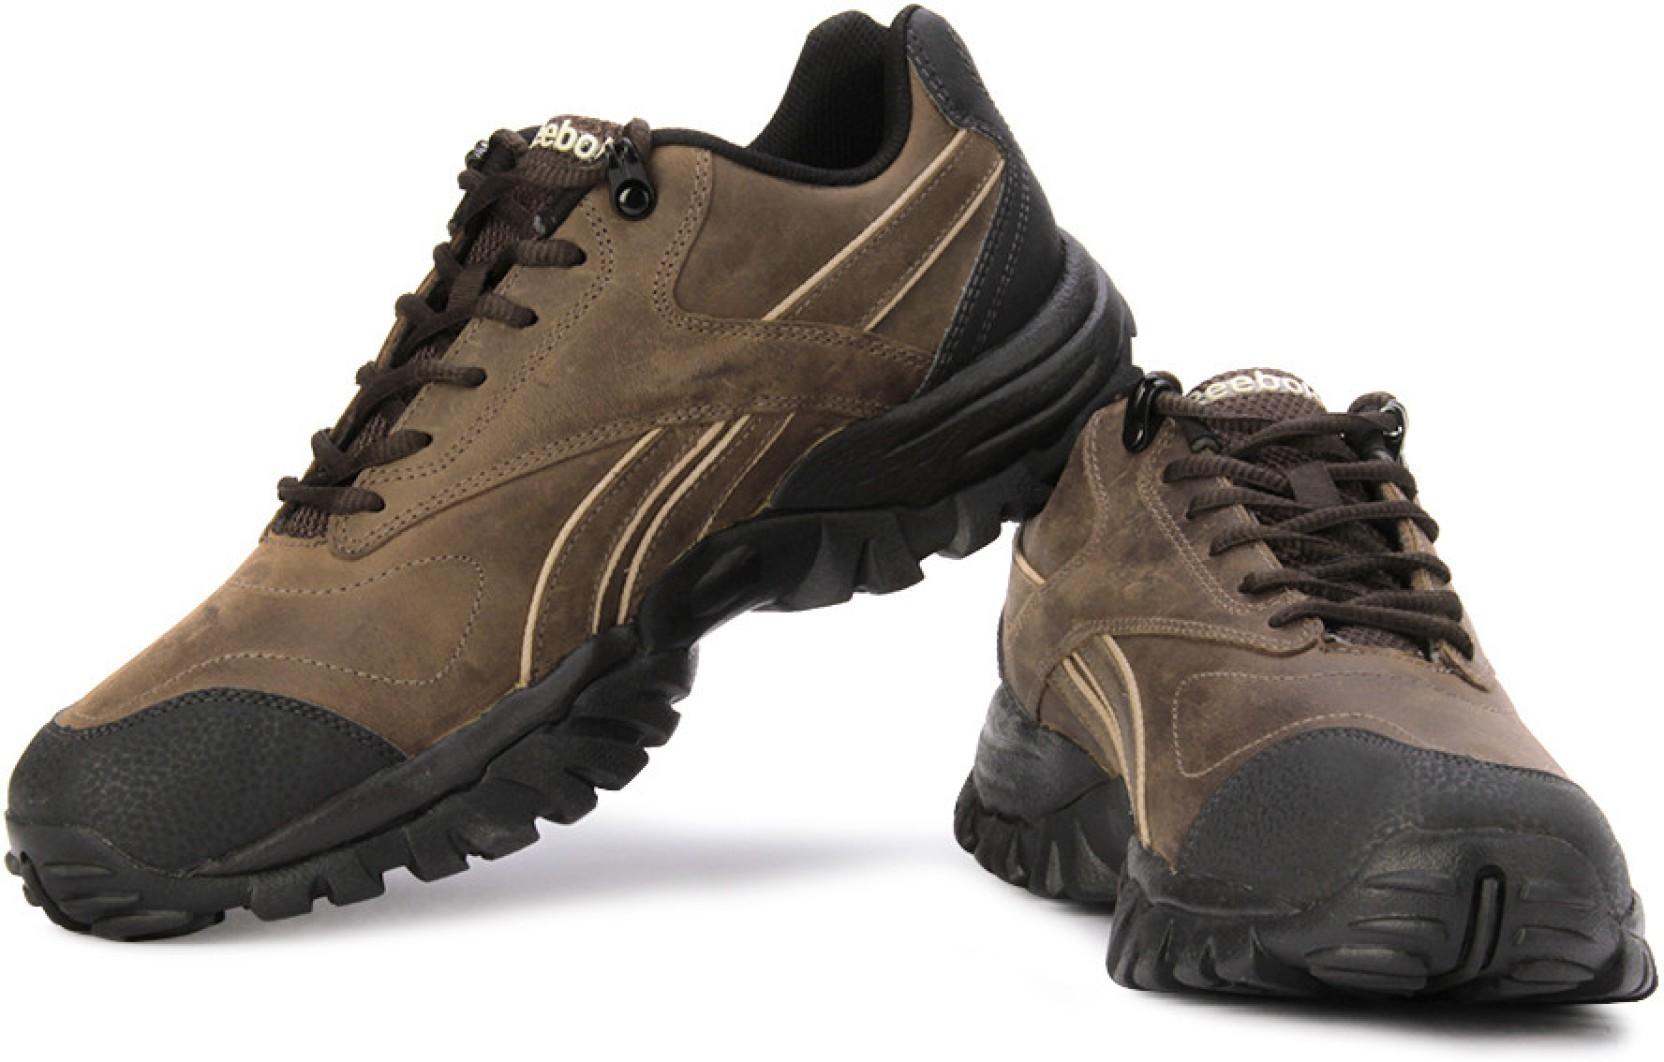 Reebok Trail Exhibit Lp Hiking Amp Trekking Shoes Buy